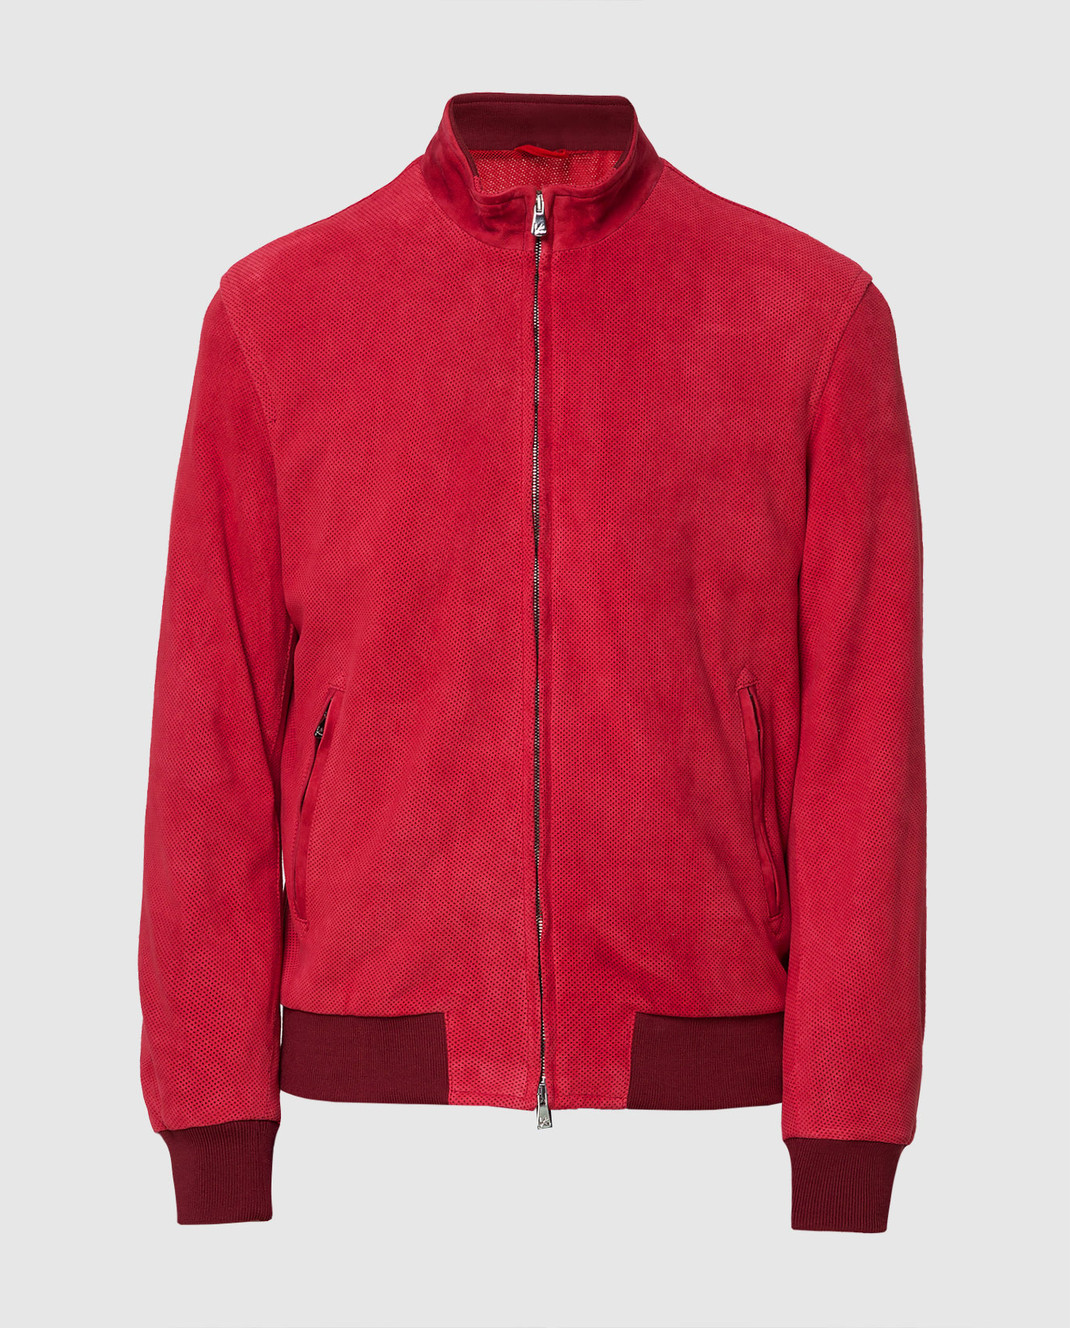 ISAIA Бордовая замшевая куртка LWT017PLW03